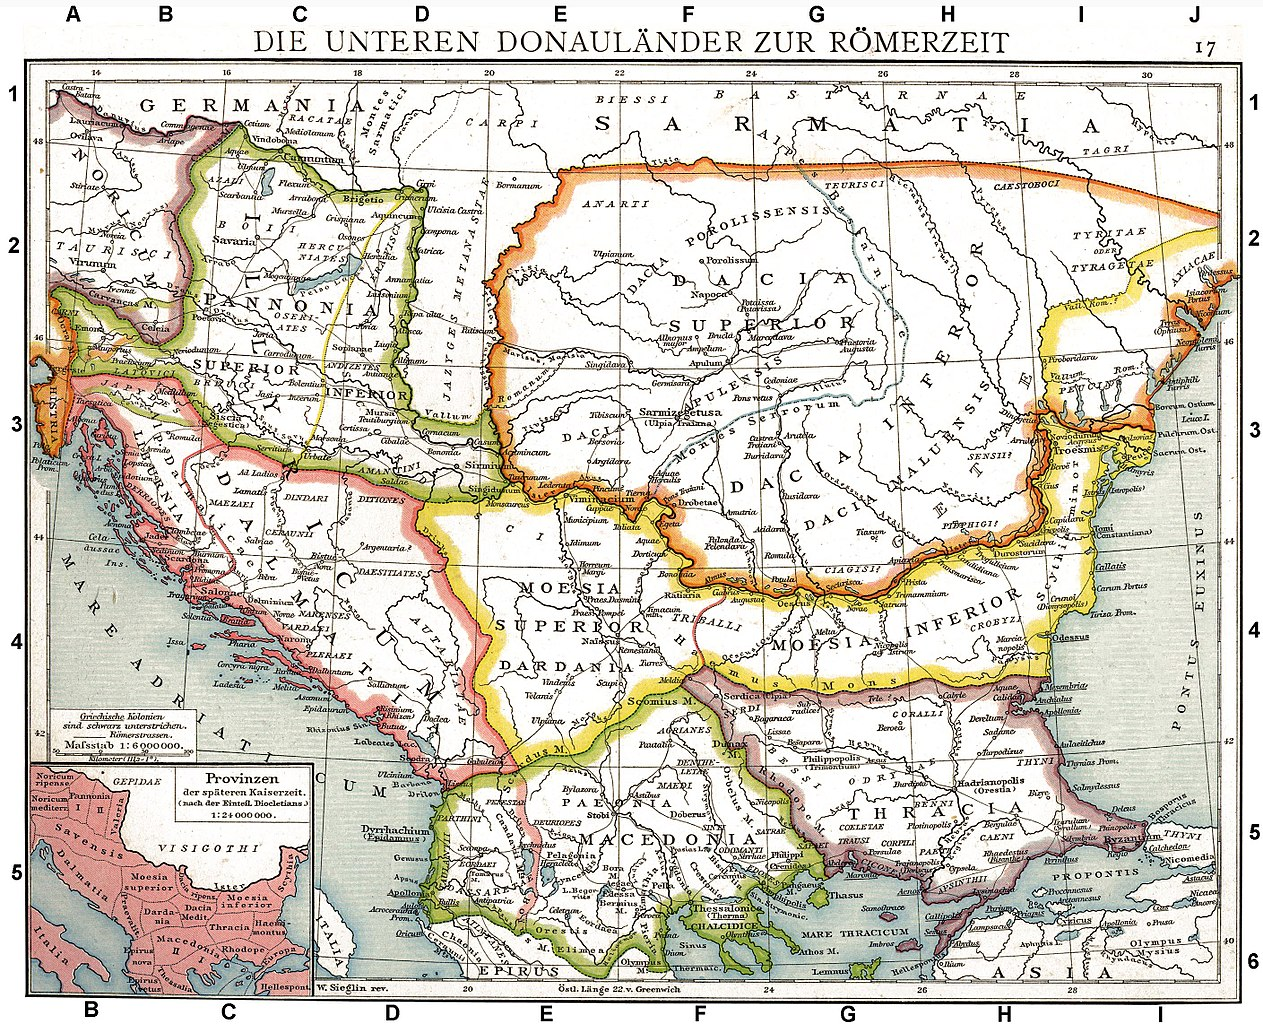 Roman provinces of Illyricum, Macedonia, Dacia, Moesia, Pannonia, and Thracia